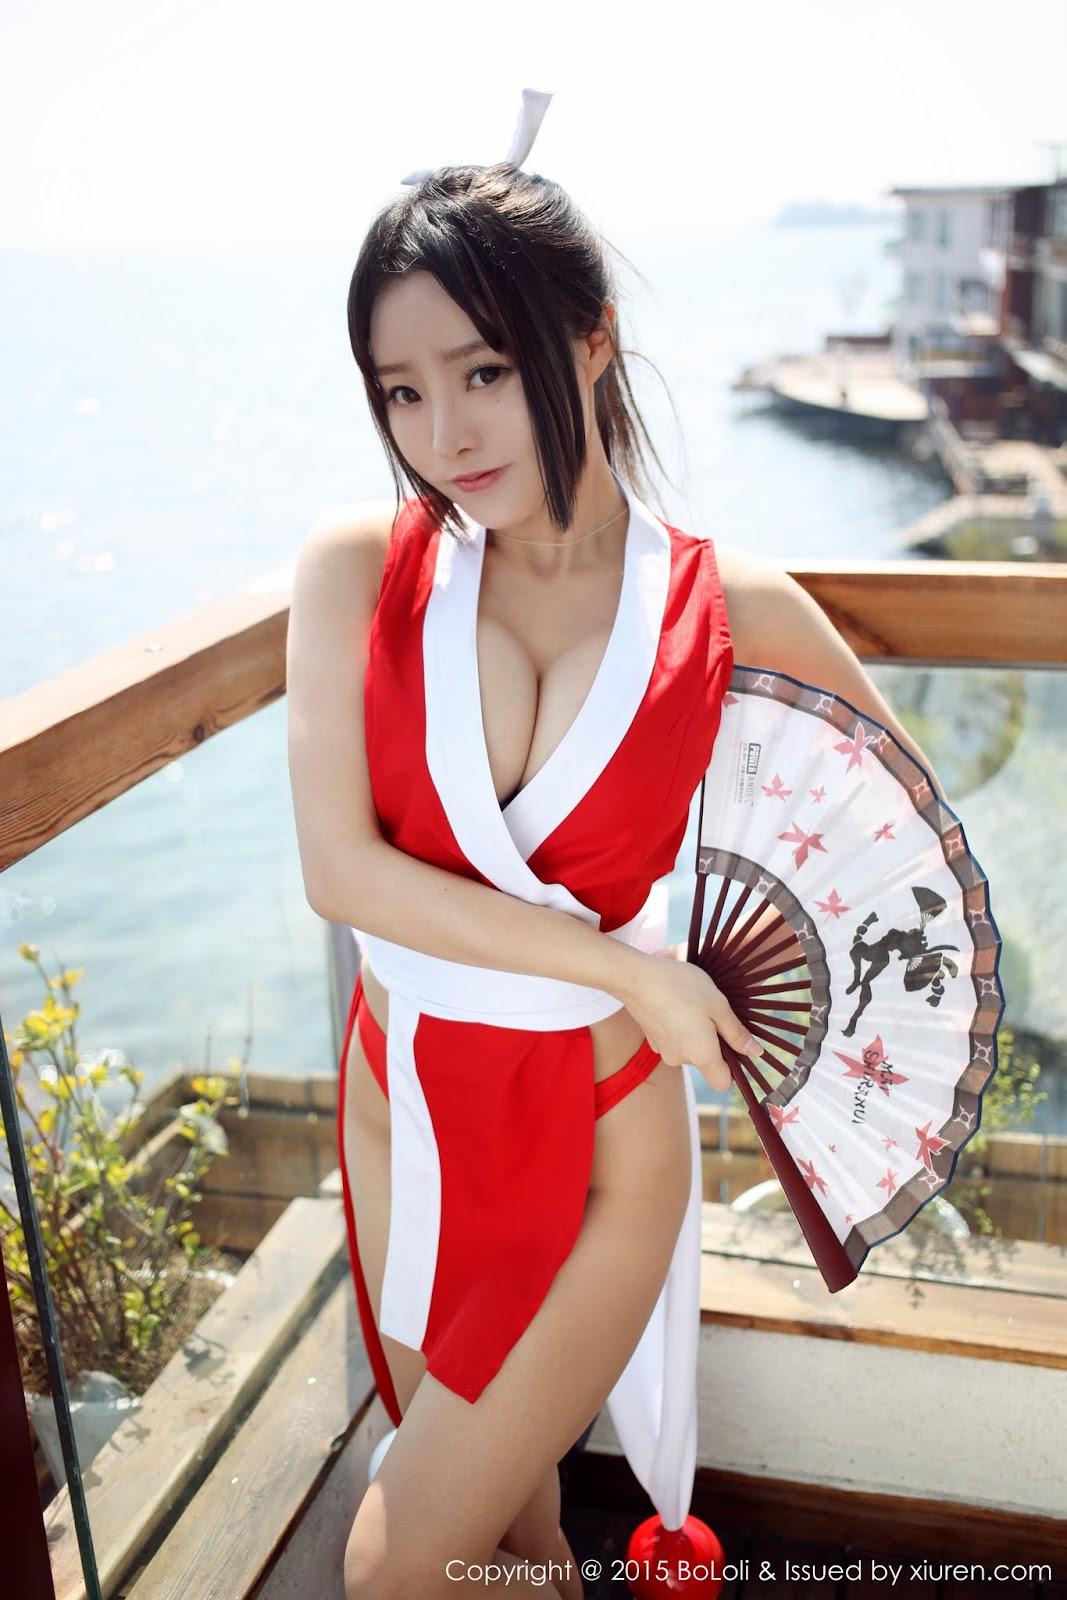 0002 - BOLOLI VOL.17 SEVENBABY Hot Girl Nude